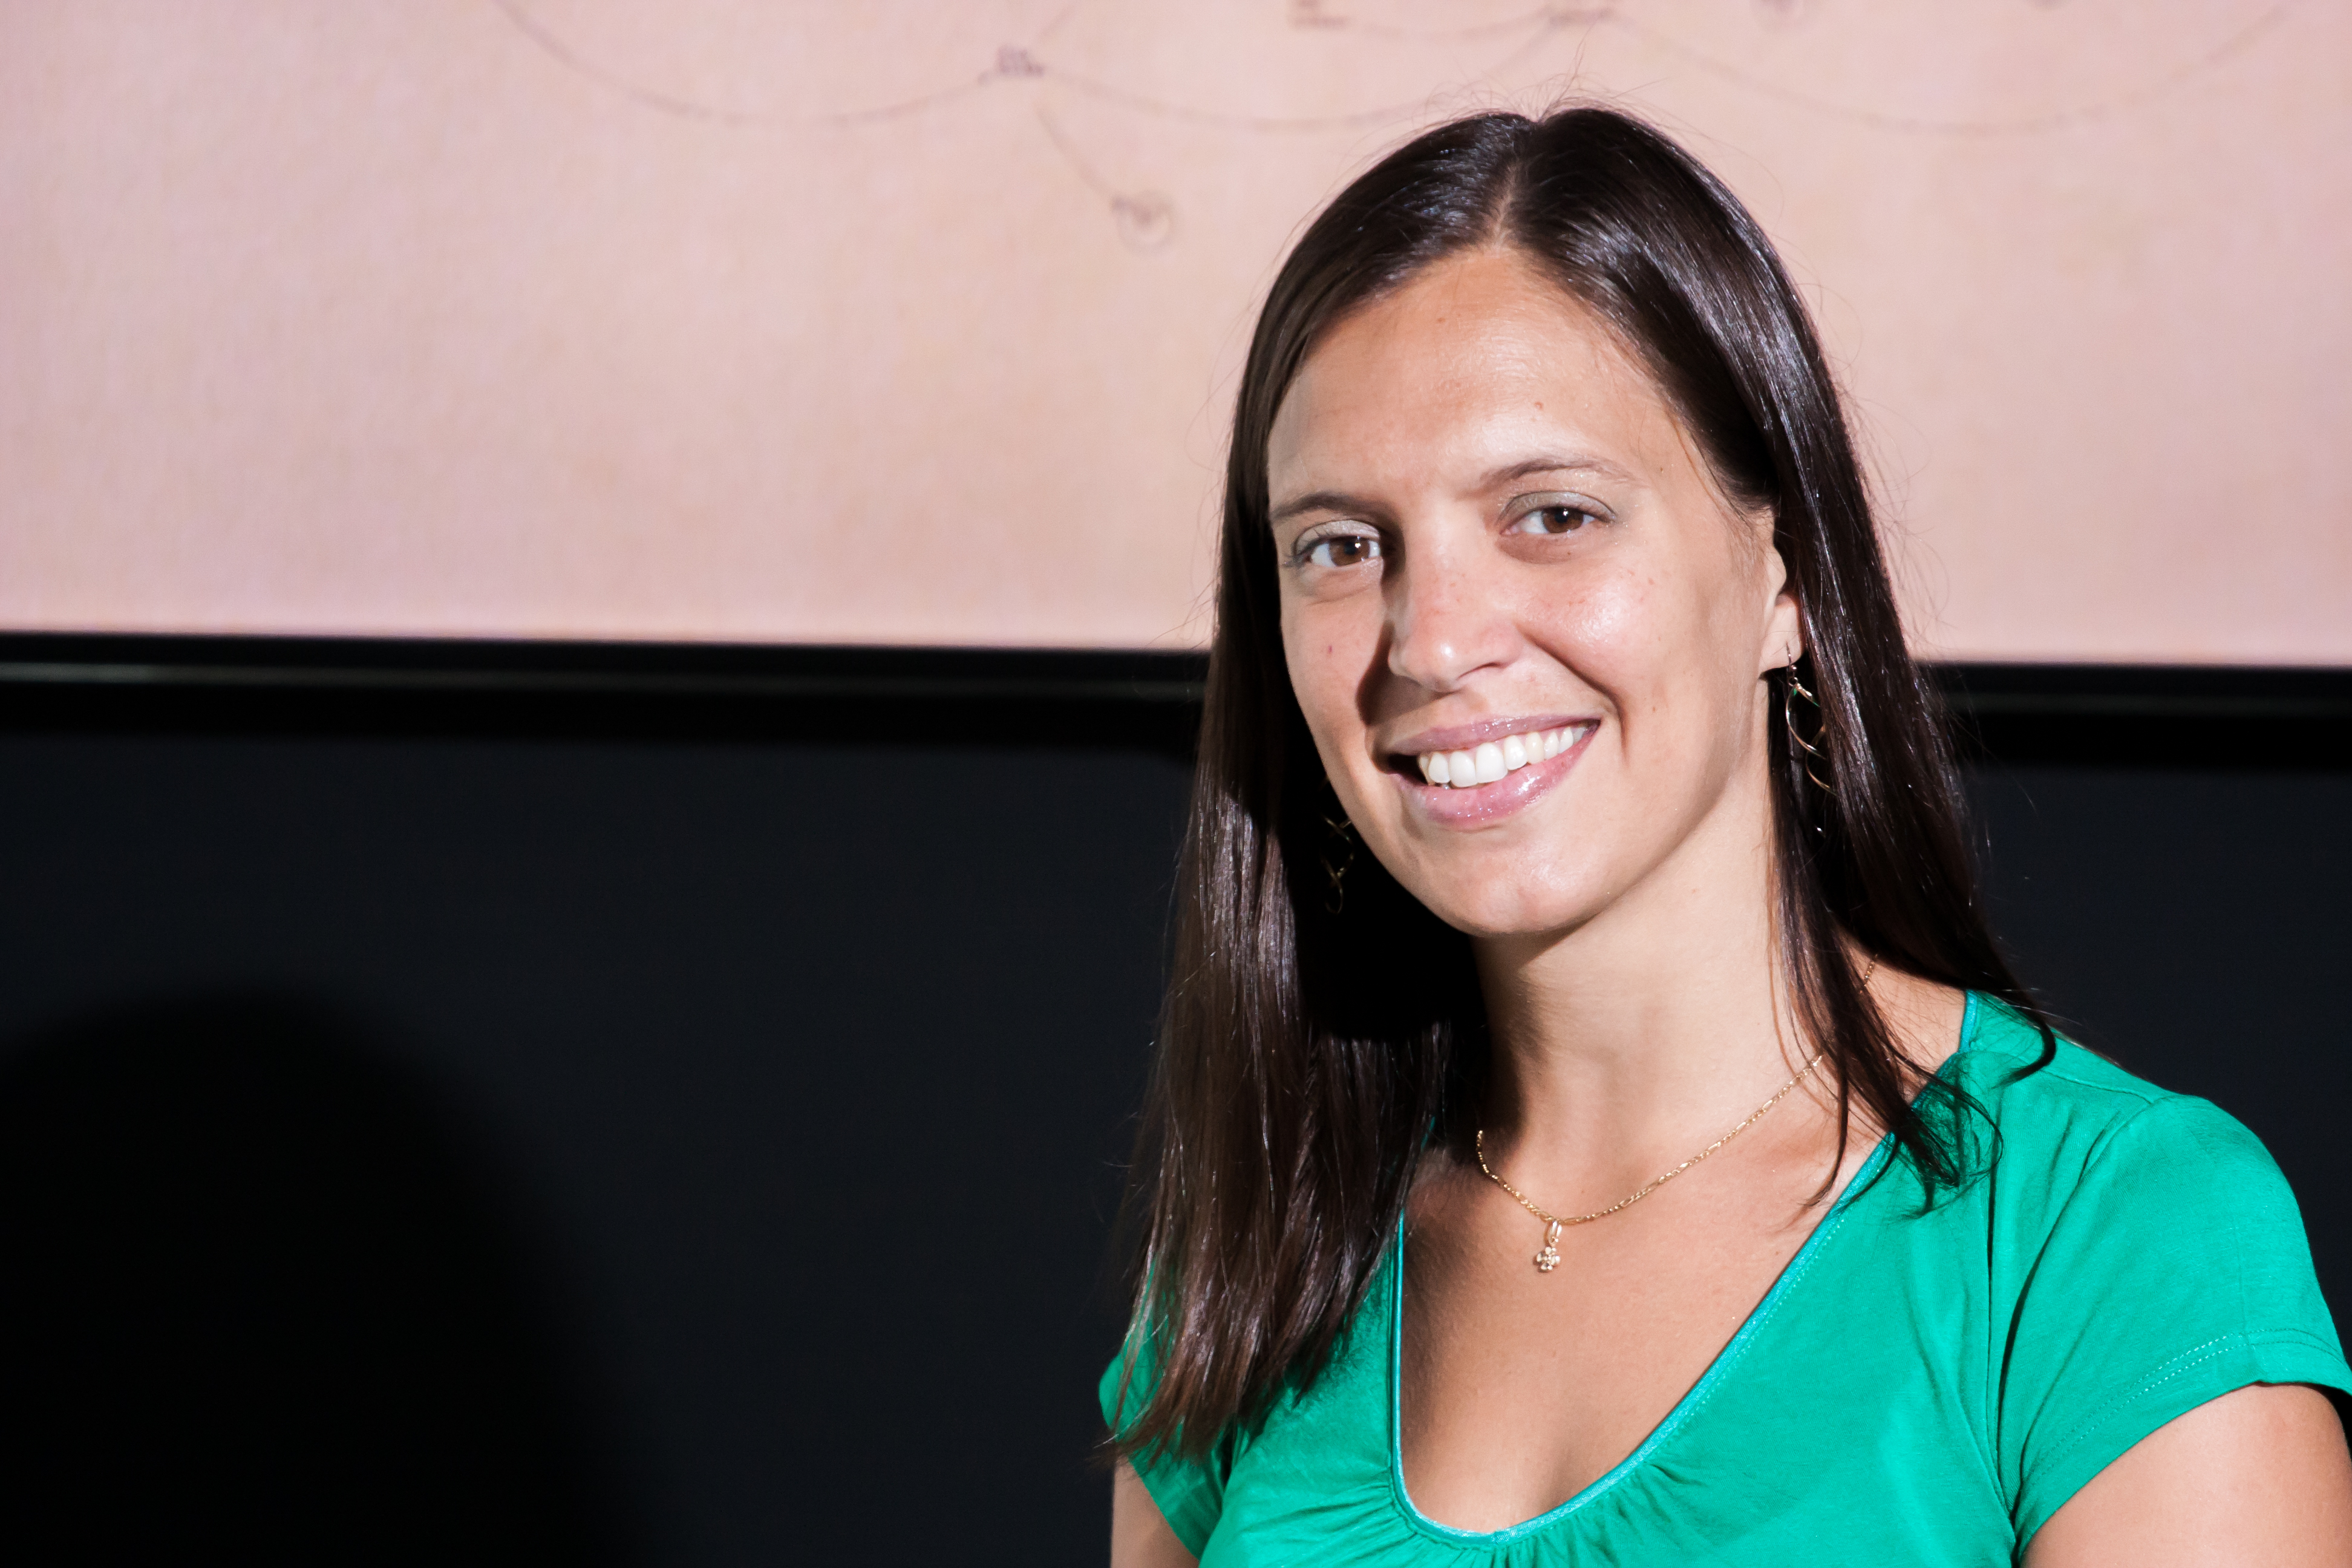 Carla Lanzillotta